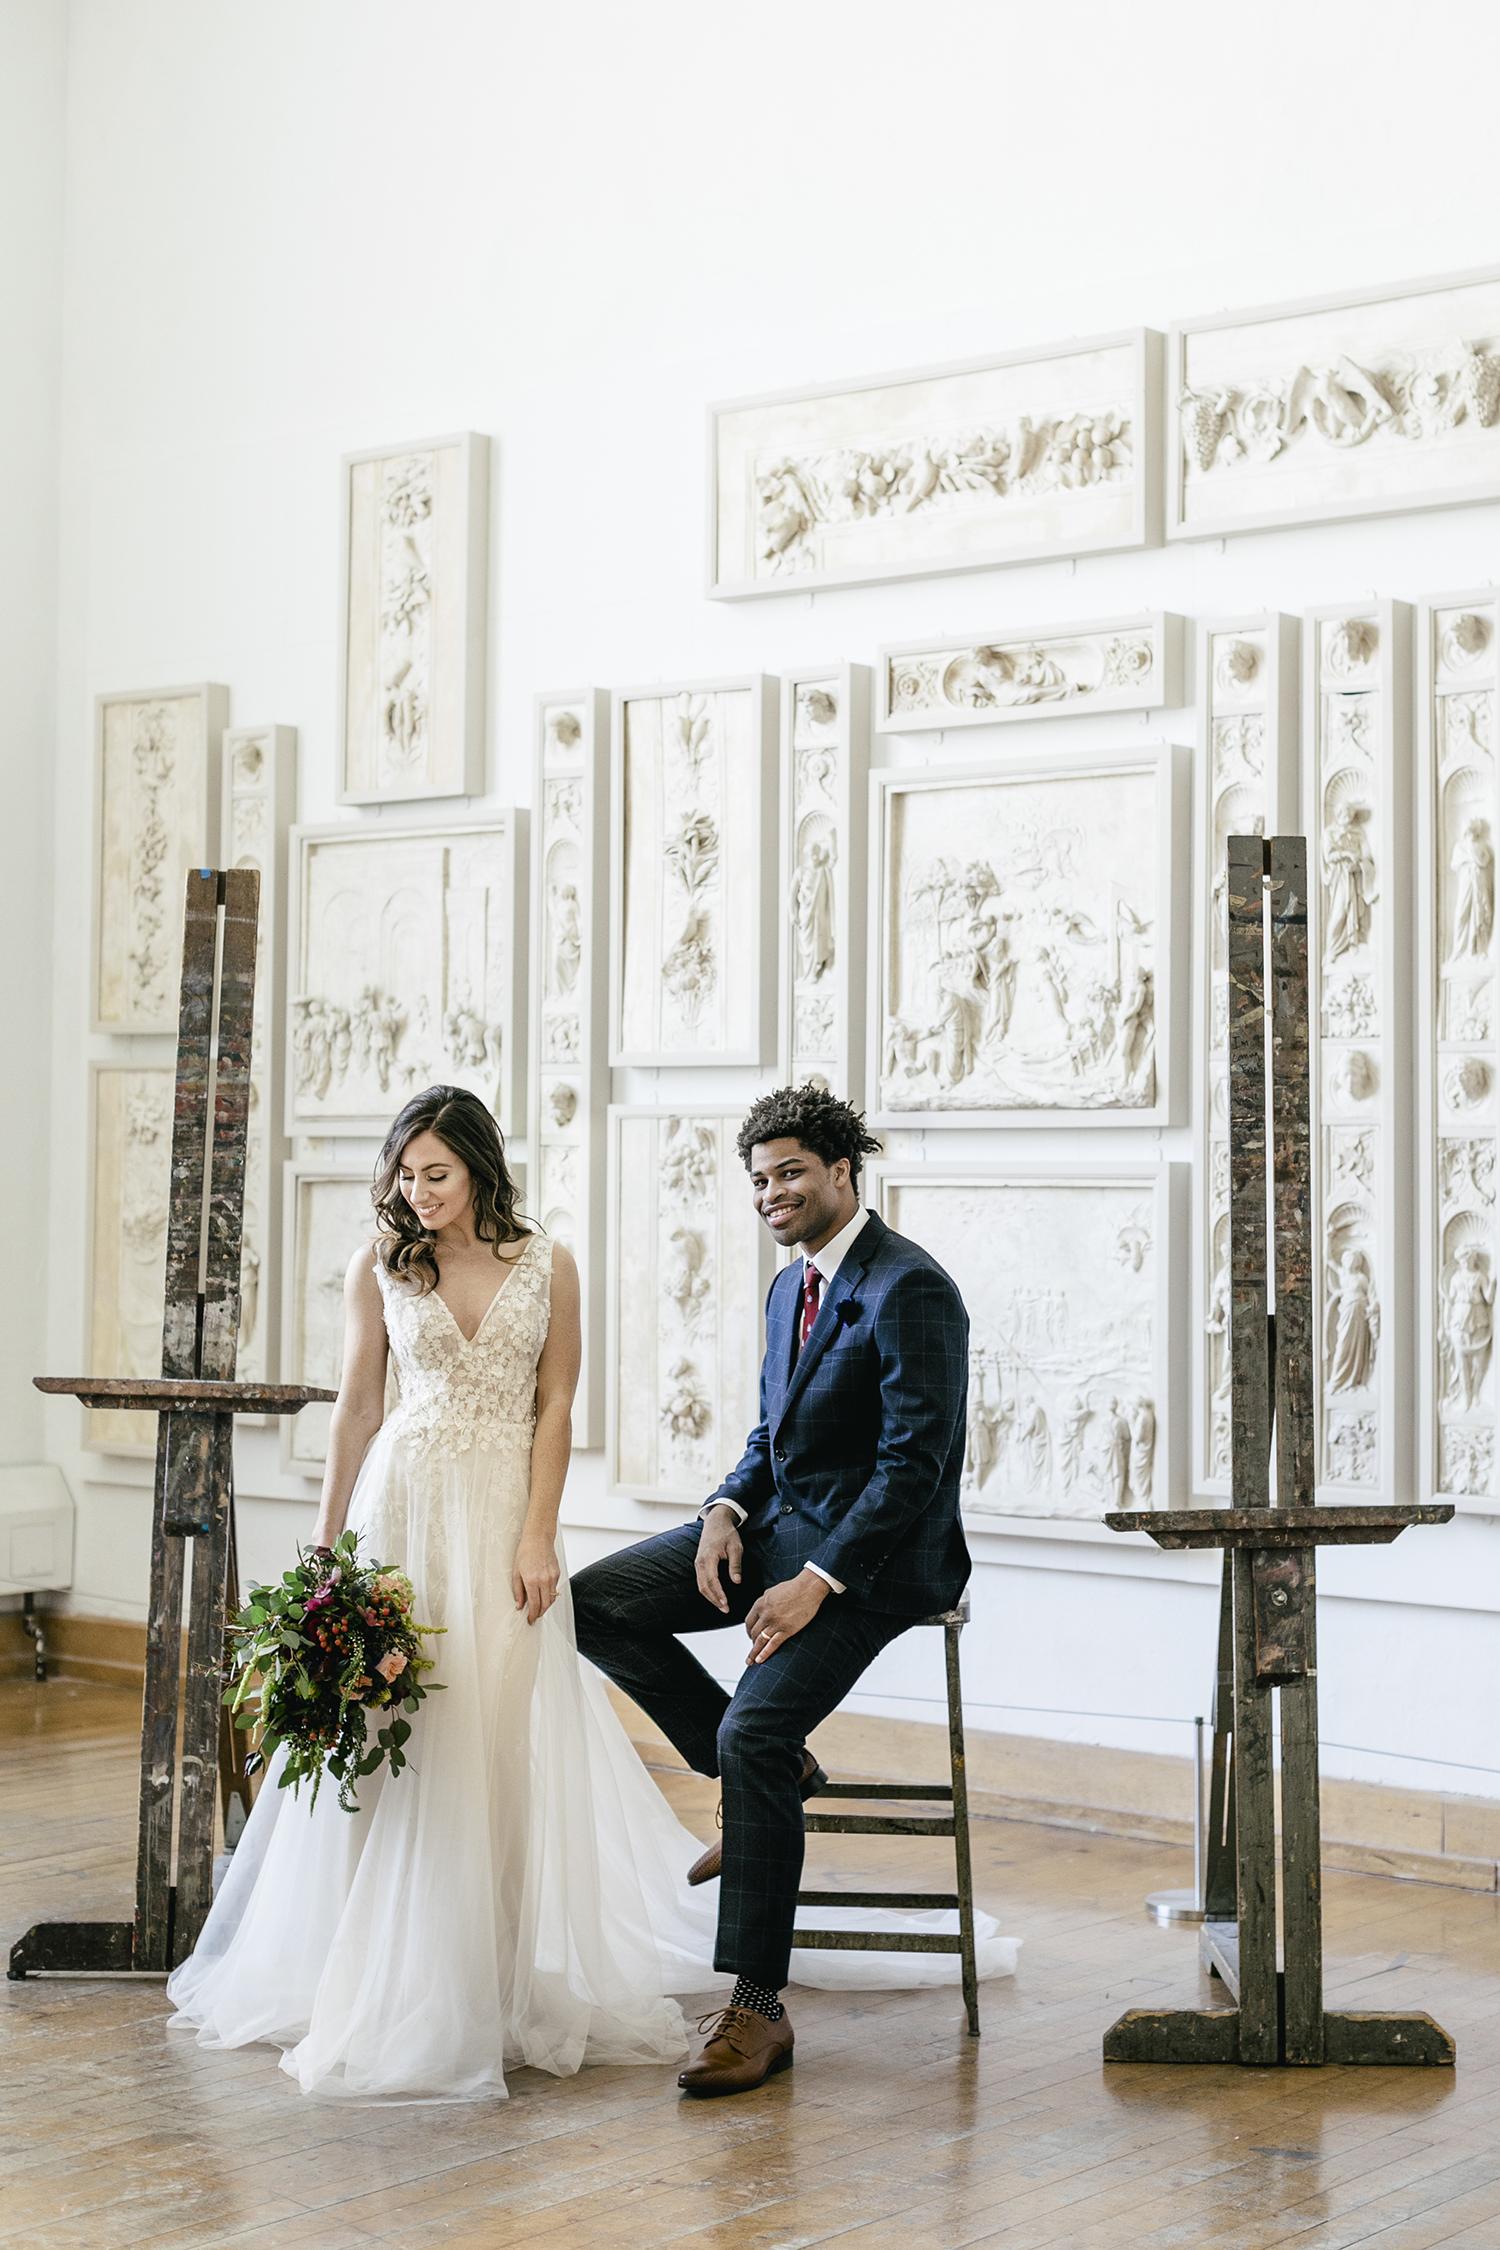 photography-wedding-weddings-natural-candid-pafa-pennsylvania academy-philadephia-philly-philadelphia wedding-mixed race-editorial-modern-fine-art-037.JPG